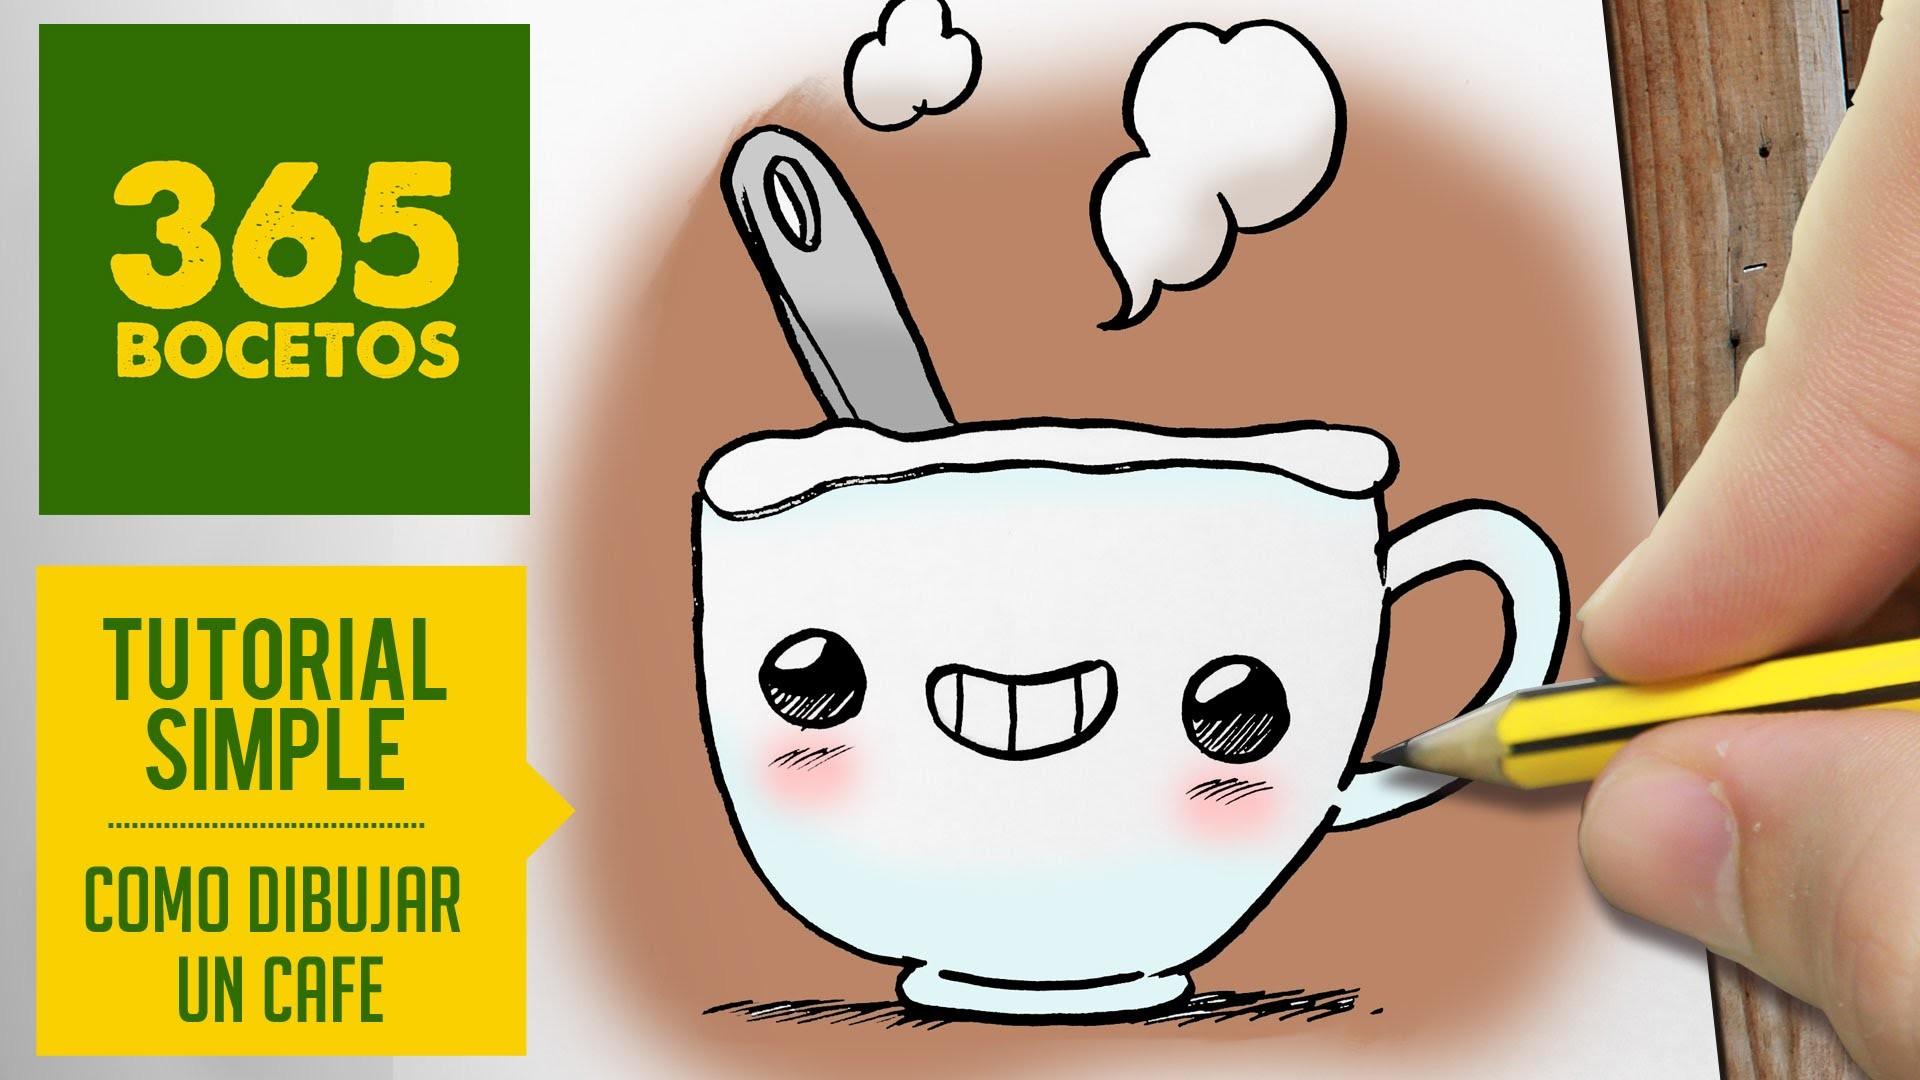 COMO DIBUJAR UN CAFE KAWAII PASO A PASO - Dibujos kawaii faciles - How to draw a coffee